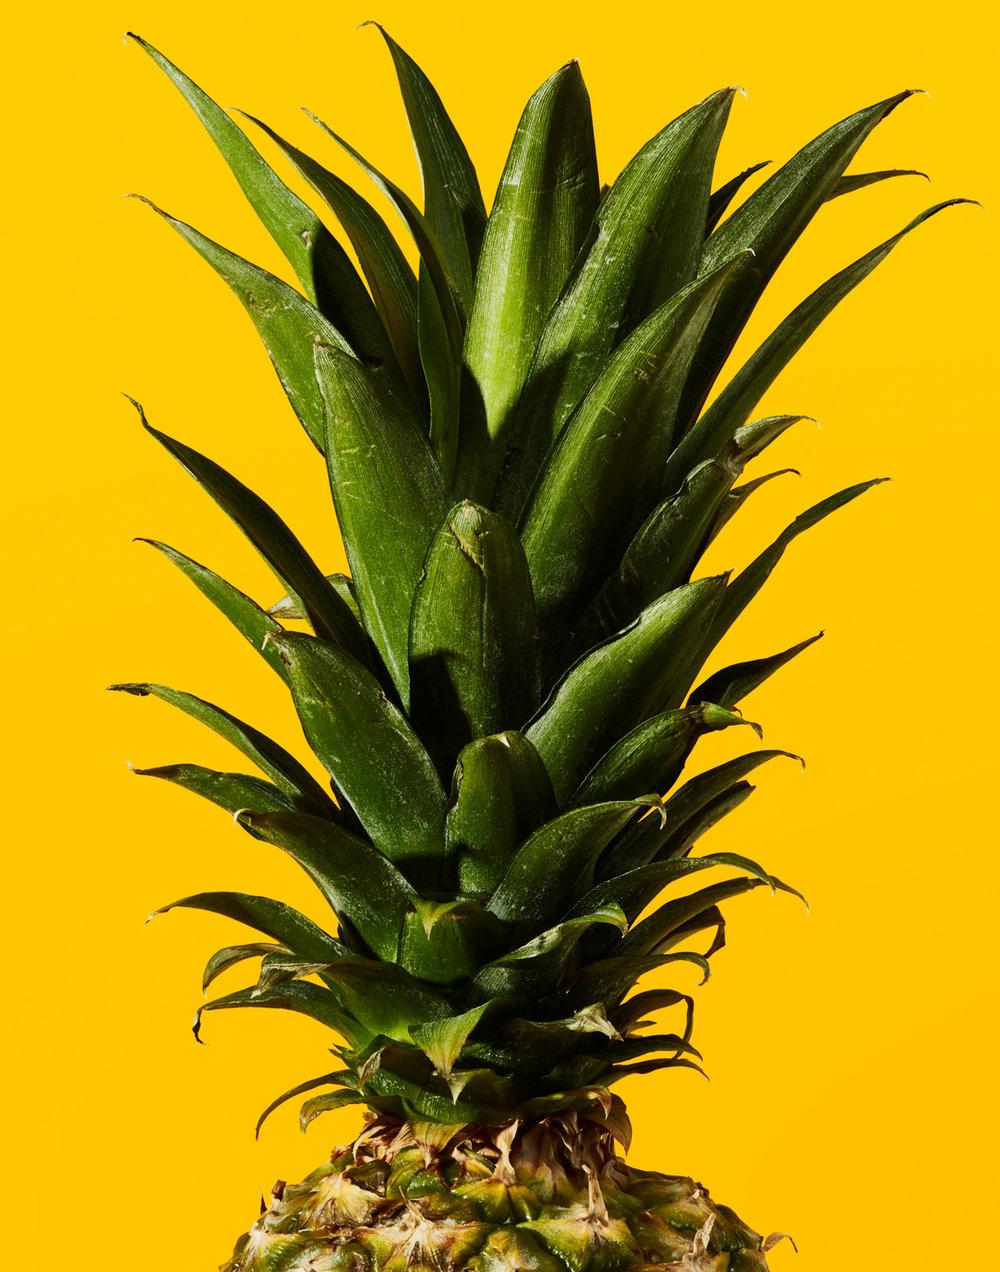 170522 Pineapple 366.jpg